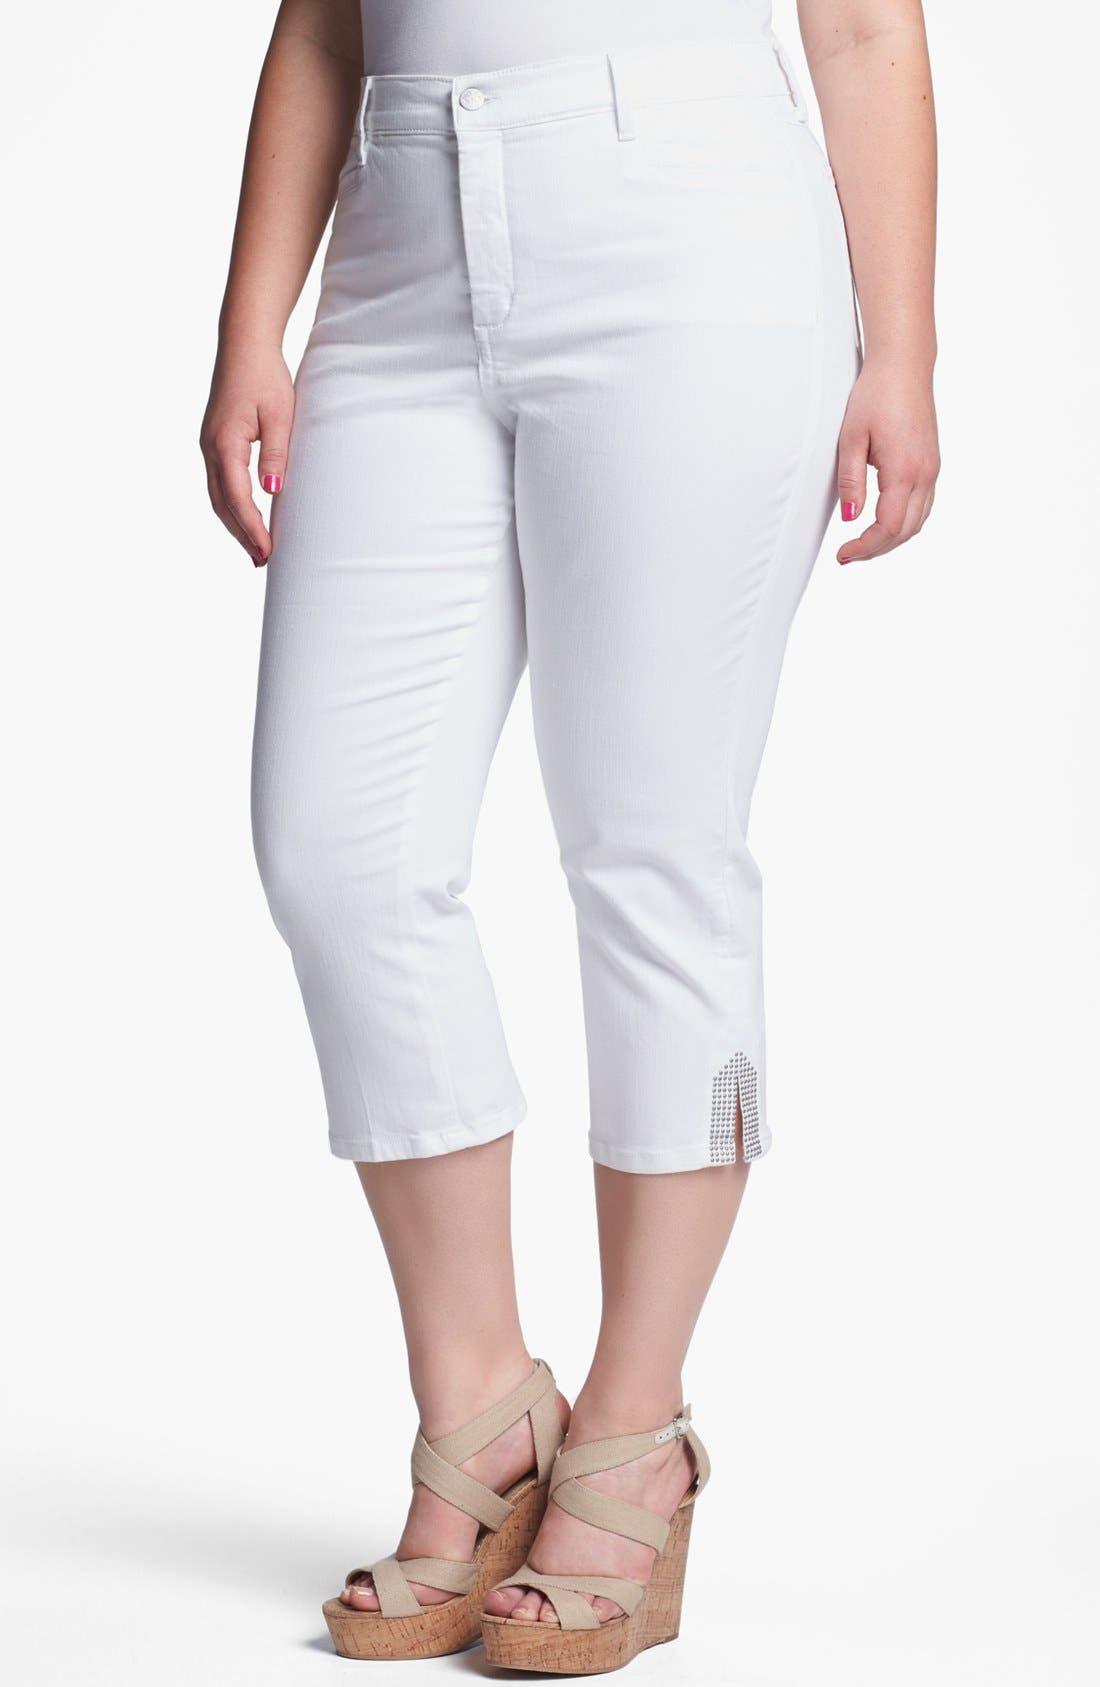 Alternate Image 1 Selected - NYDJ 'Suzy' Crop Jeans (Plus Size)